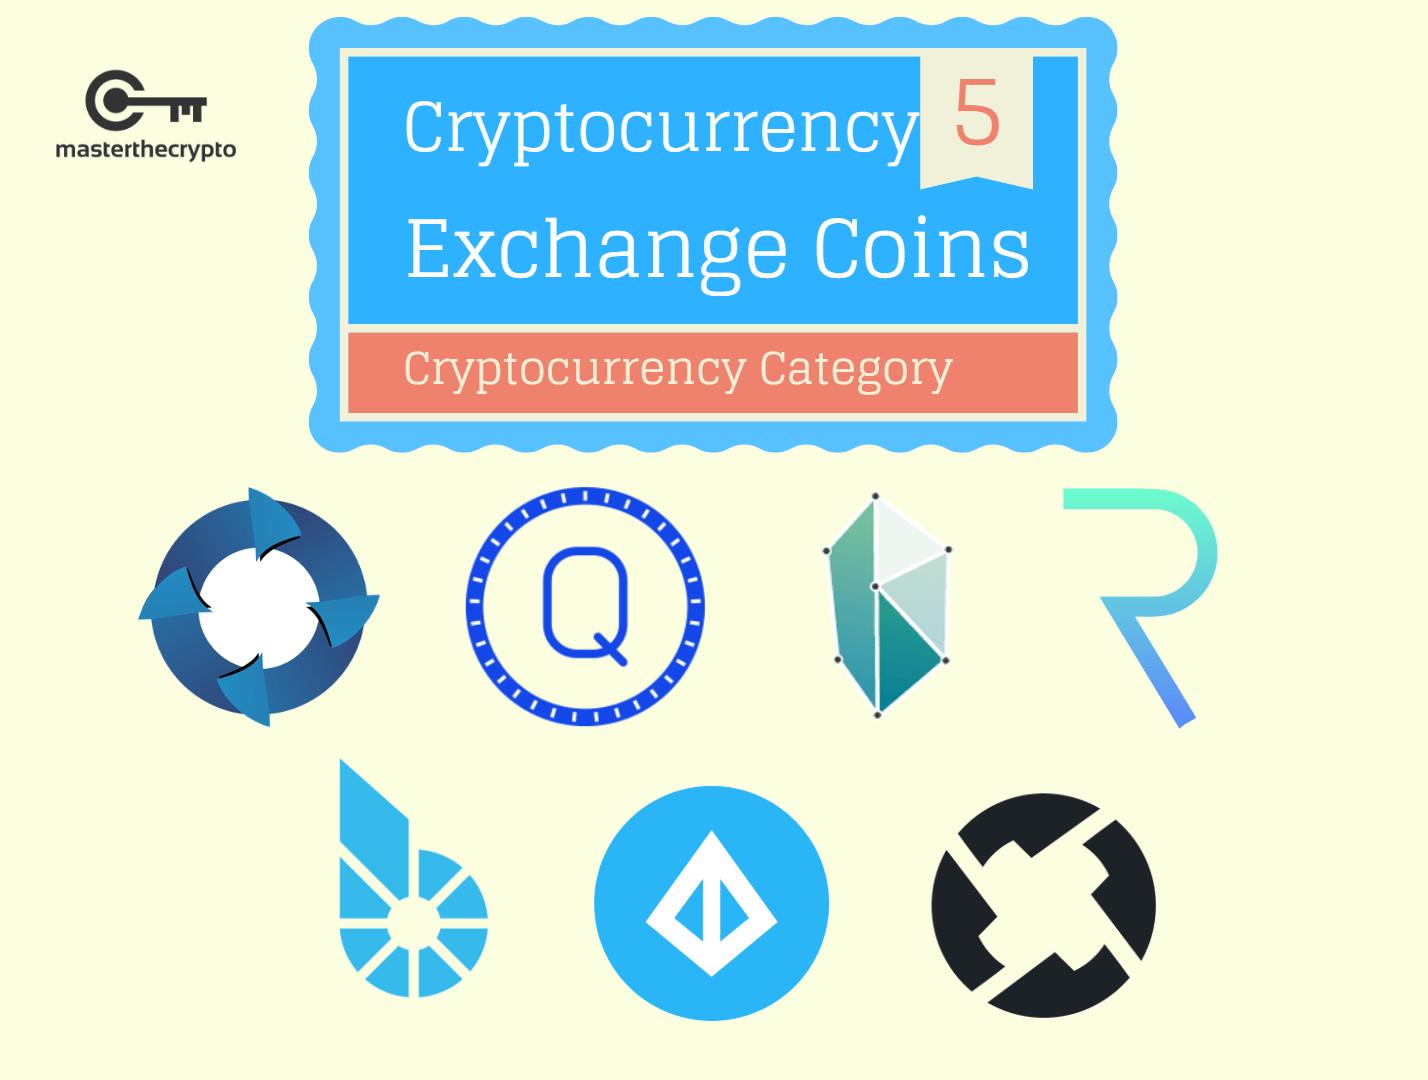 cryptocurrency exchange, cryptocurrency exchange coins, exchange coins, payment networks, payment network